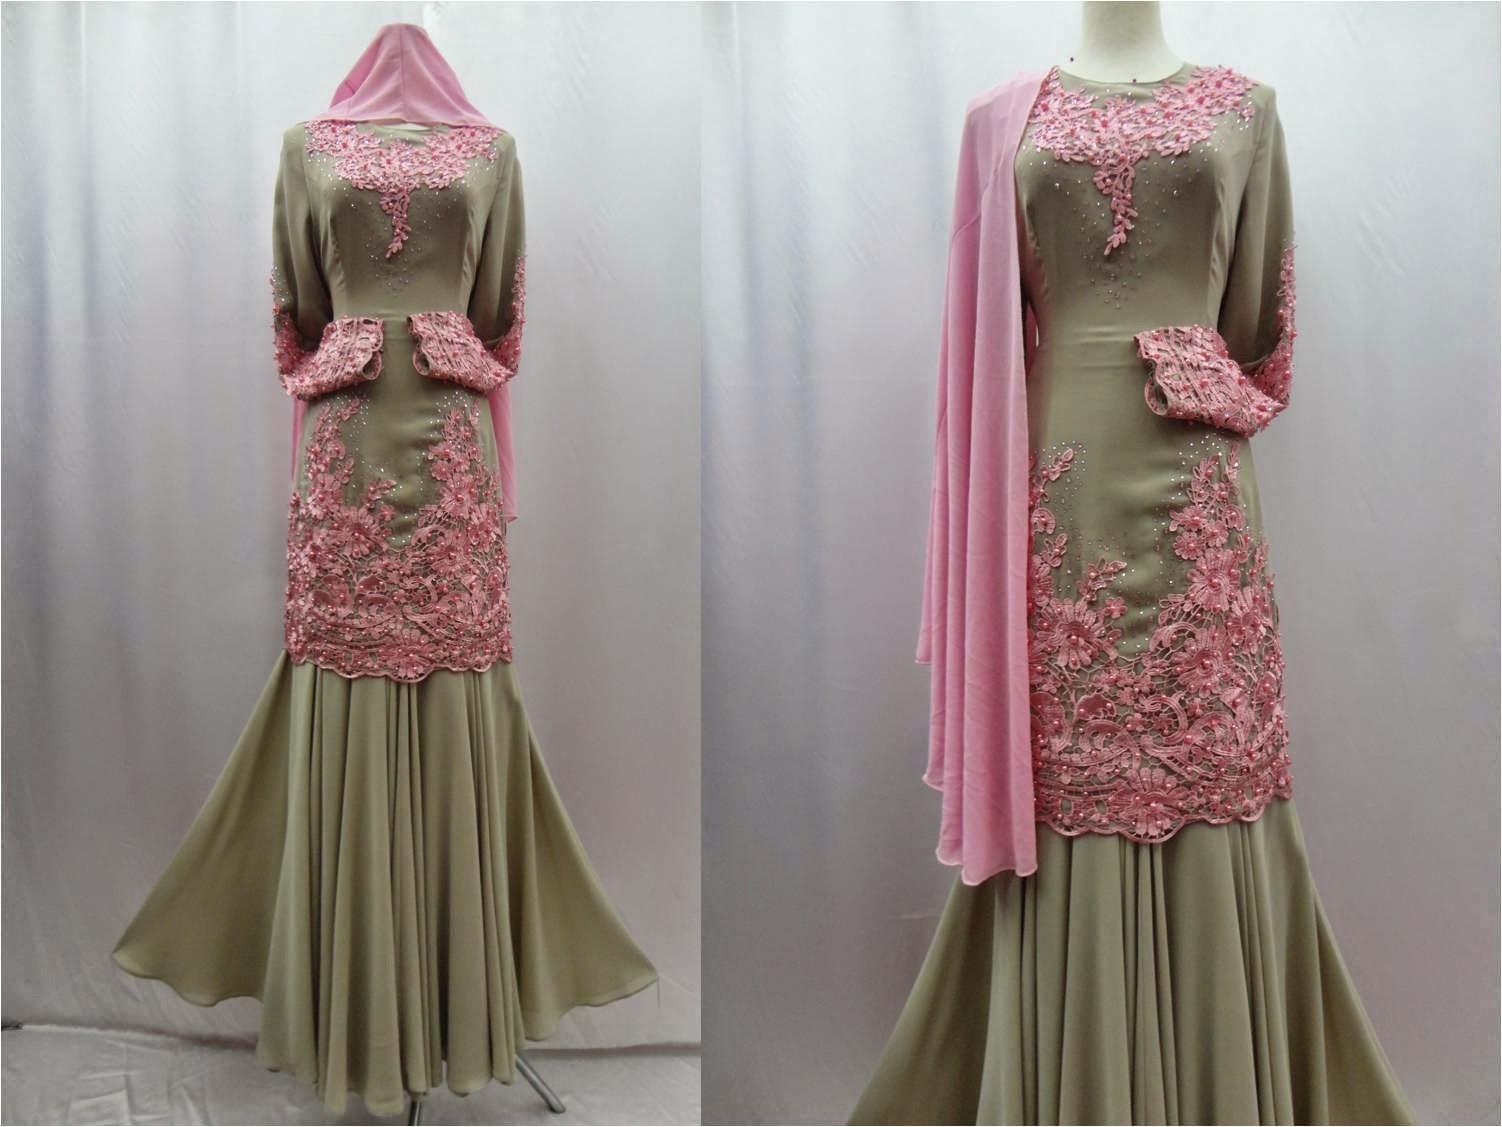 Design Terkini Baju Kurung 2014 Fesyen Muslimah Modern